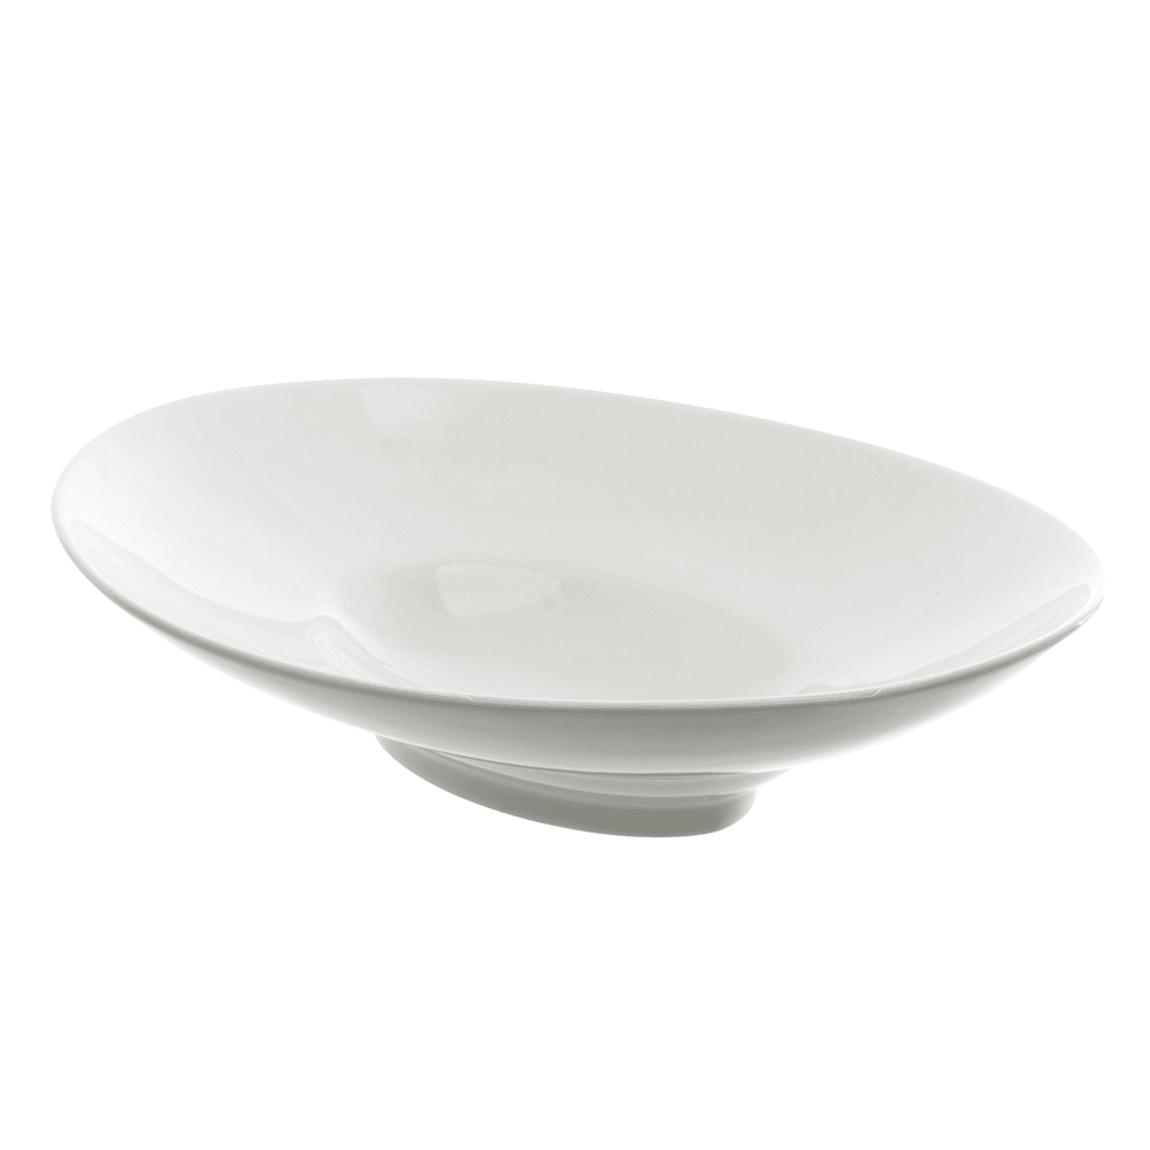 10 Strawberry Street WTR-10OVLBWL 4 oz Oval Bowl - Porcelain, White